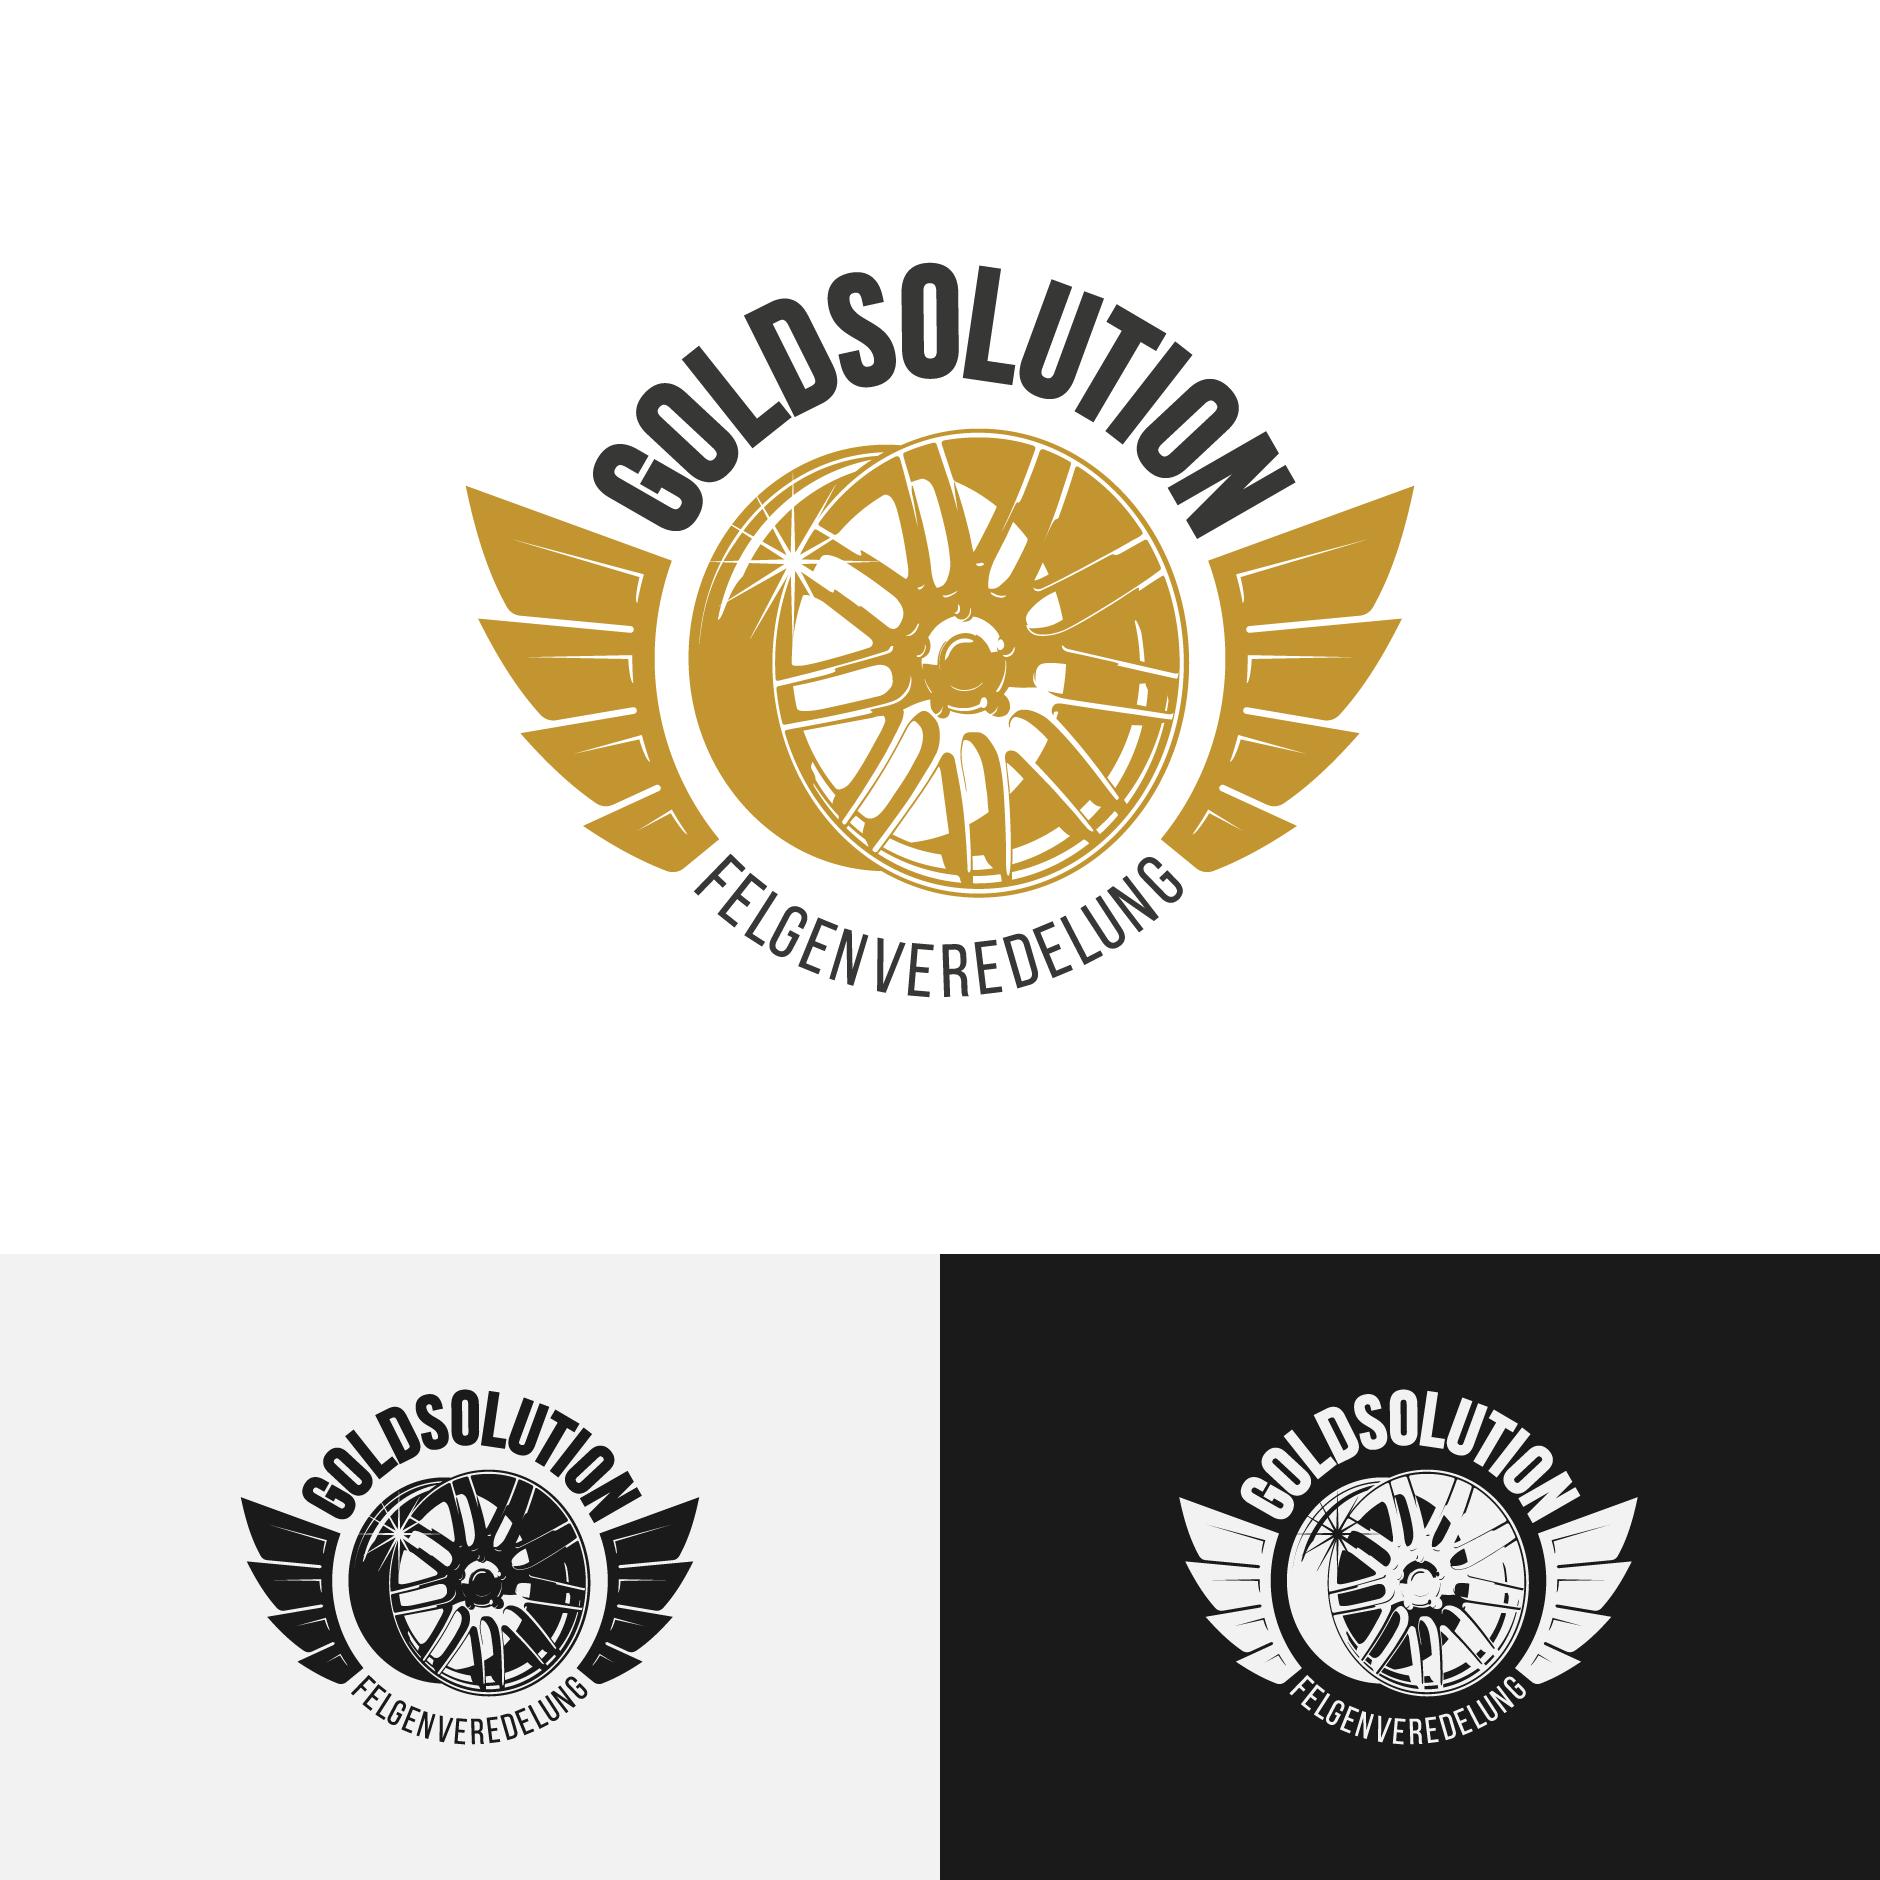 GOLDSOLUTION logodesign-Logodesign Goldsolution